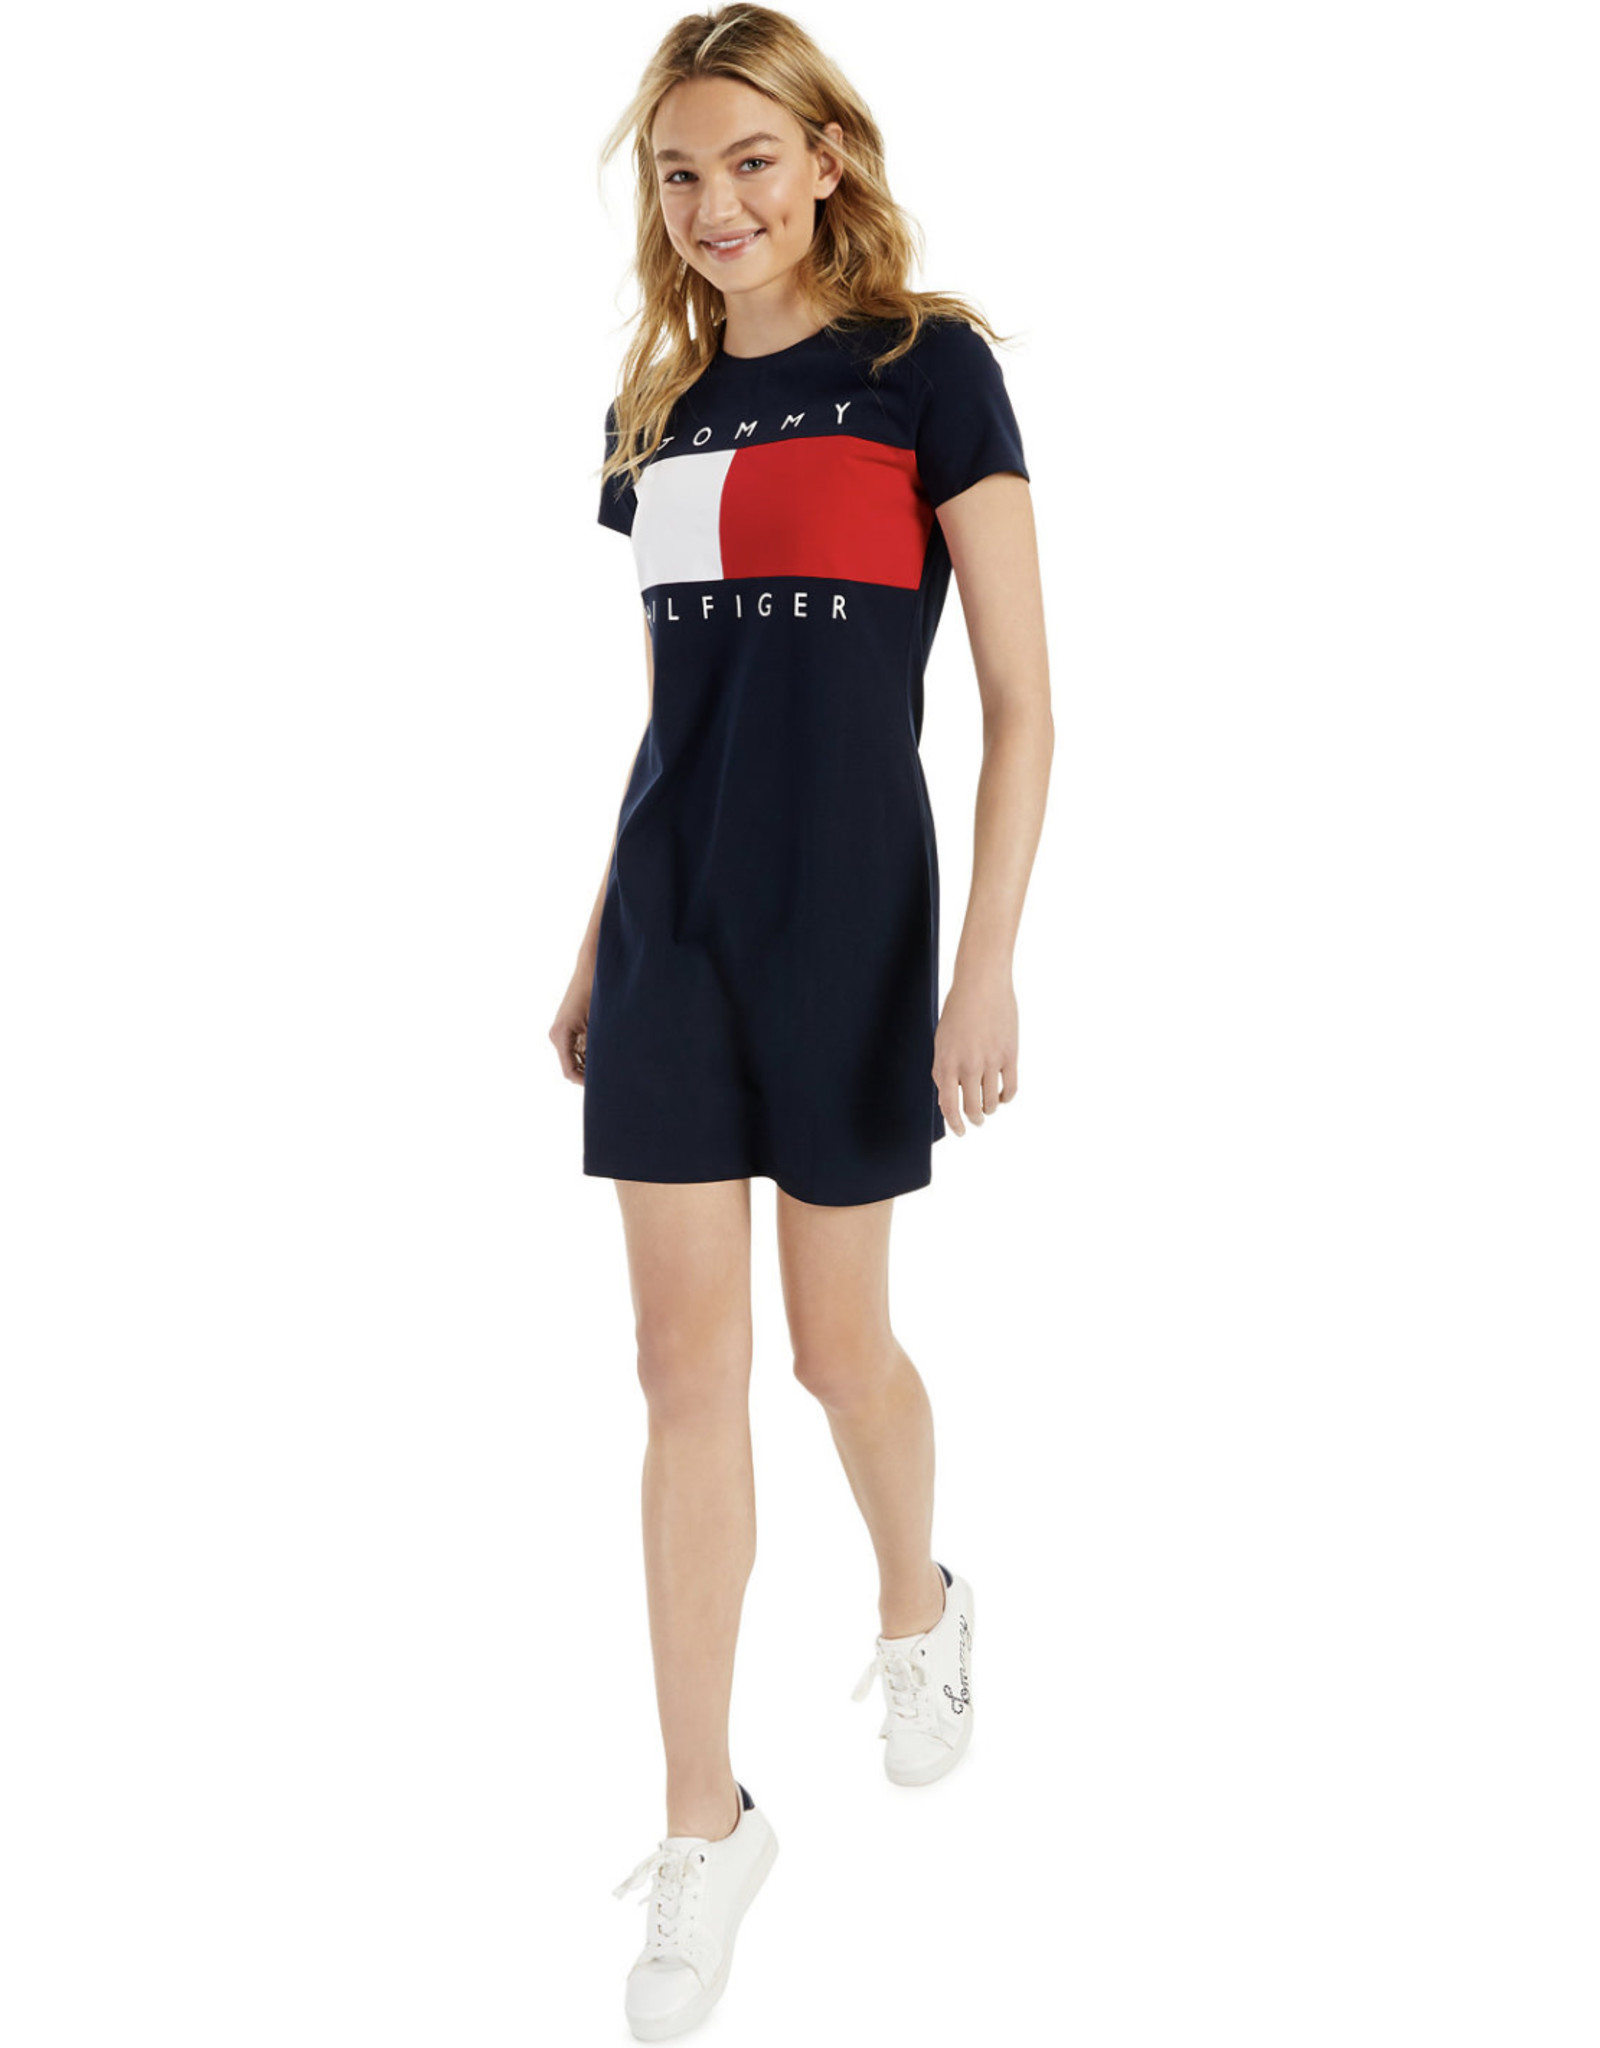 Tommy Hilfiger Tommy Hilfiger Logo T-Shirt Dress